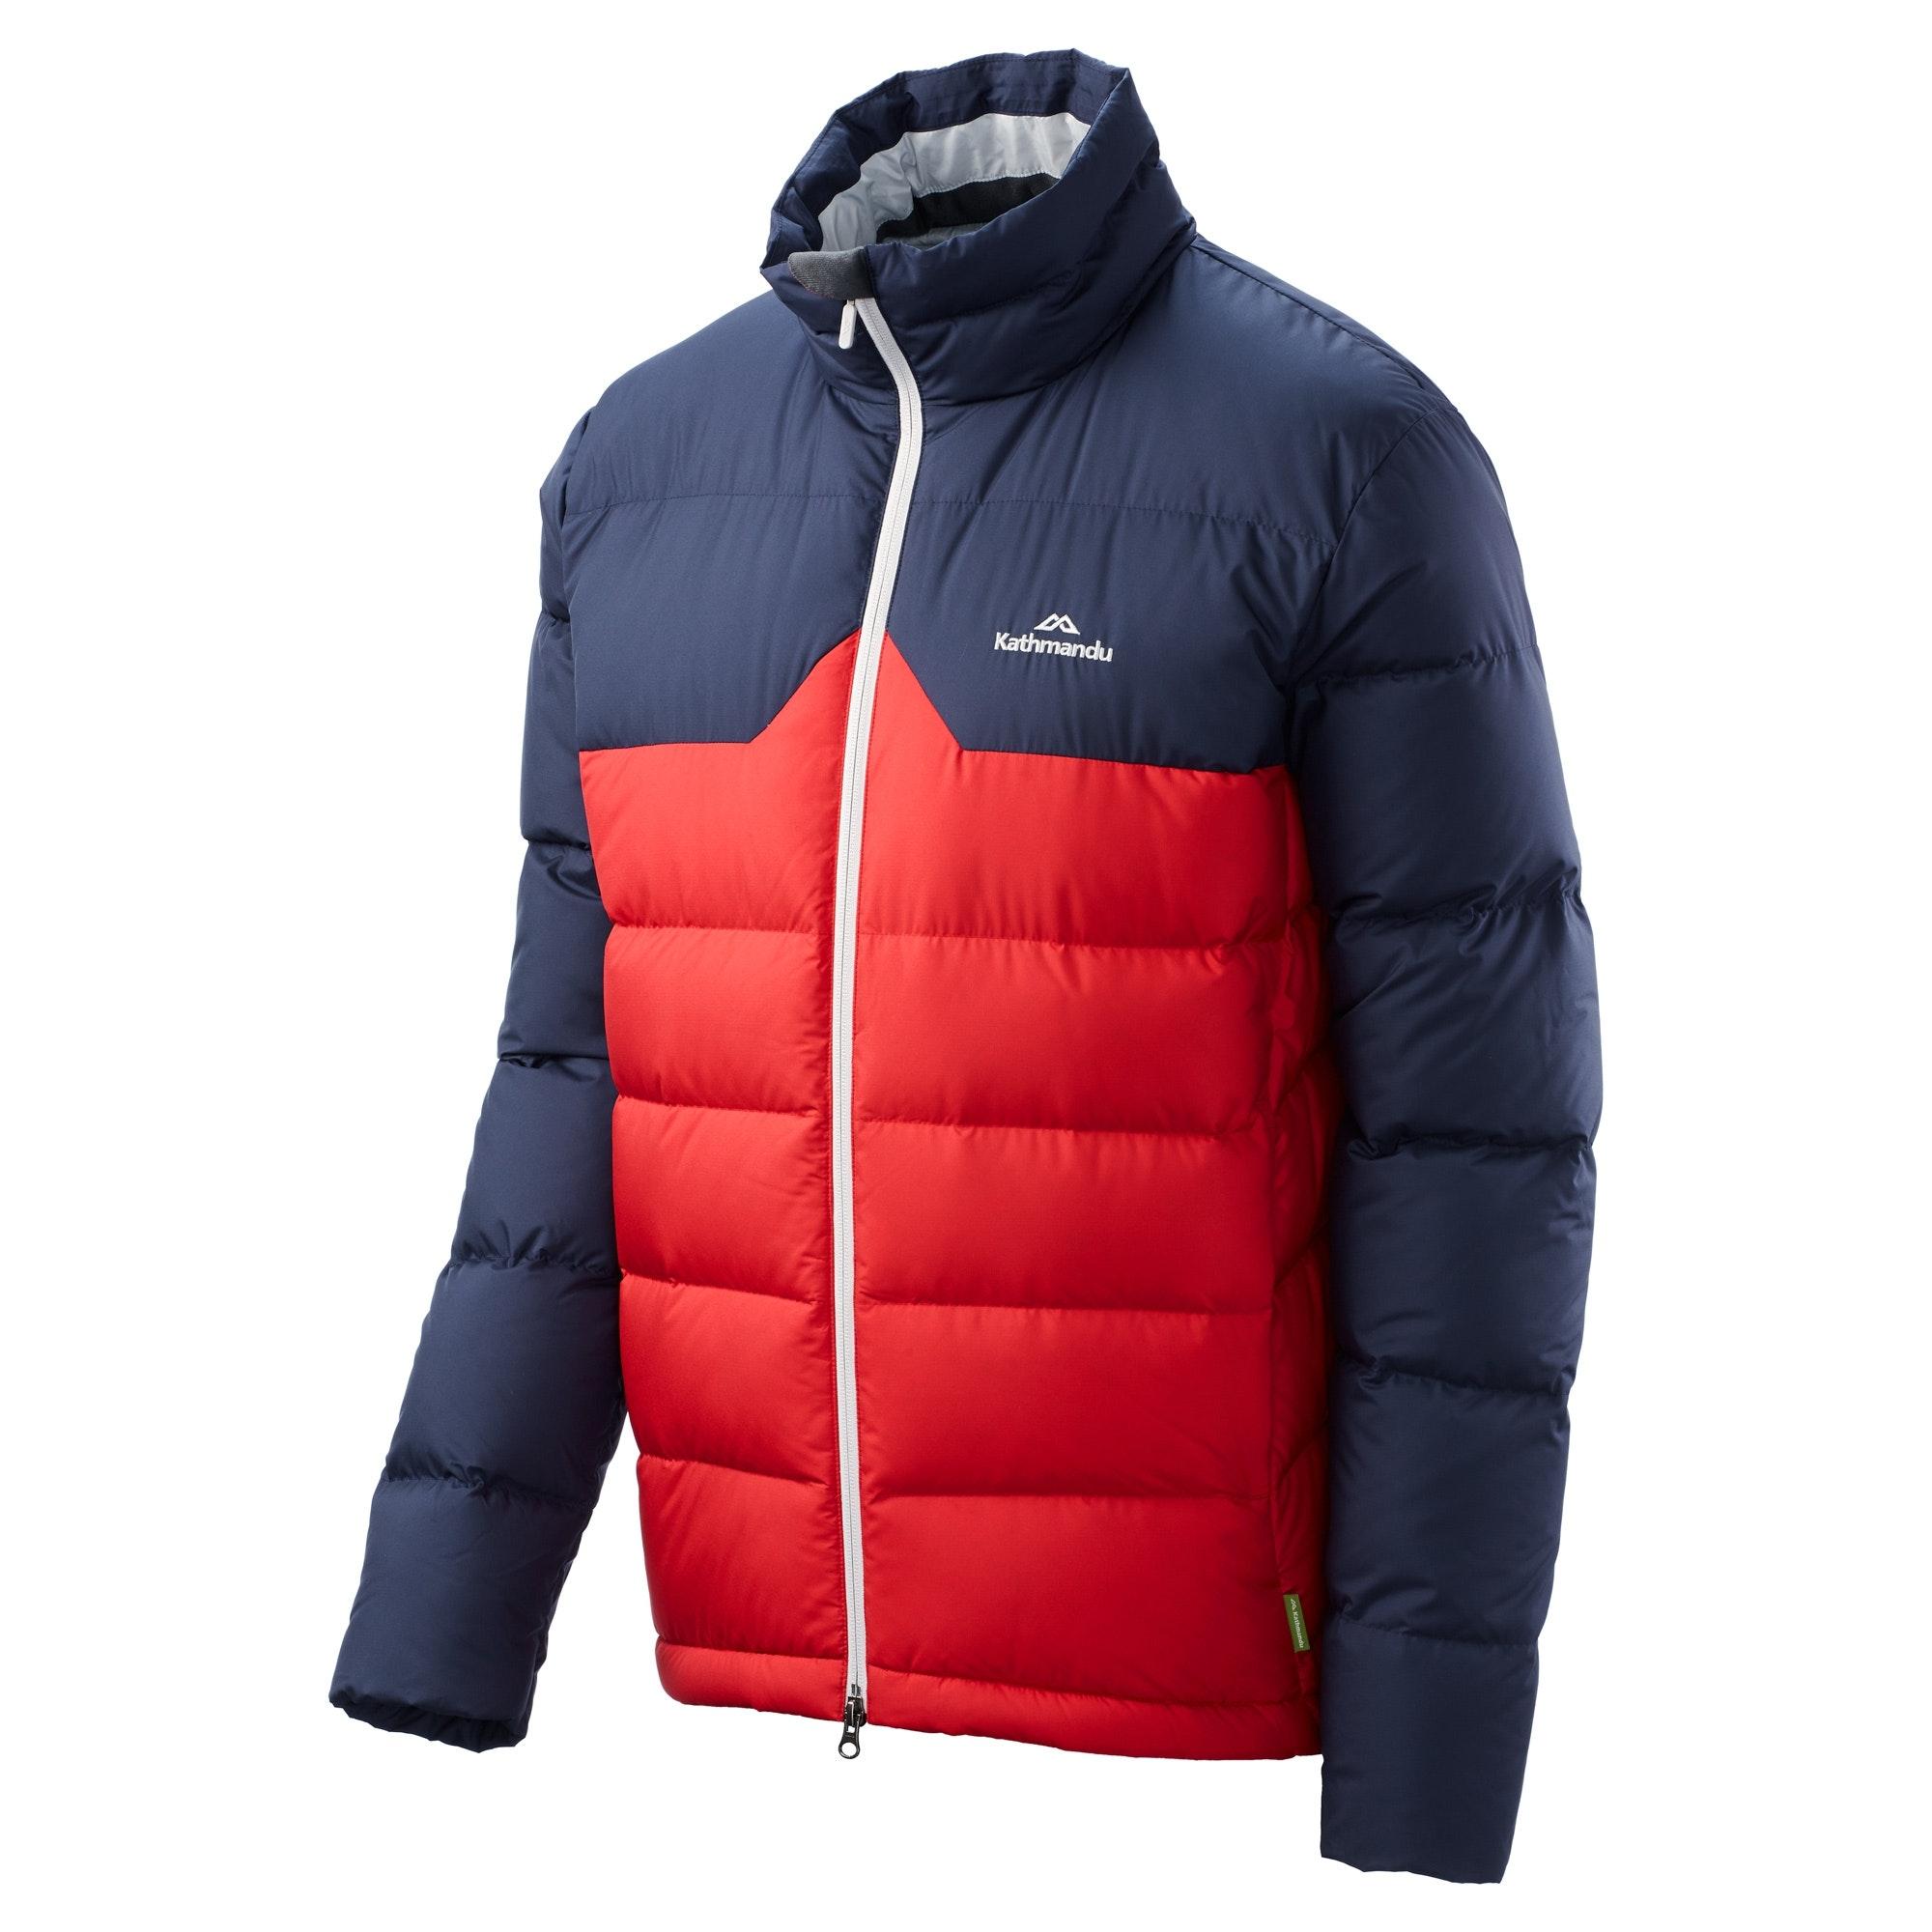 Kathmandu-Epiq-Men-039-s-Warm-Winter-Duck-Down-Puffer-Jacket-v2